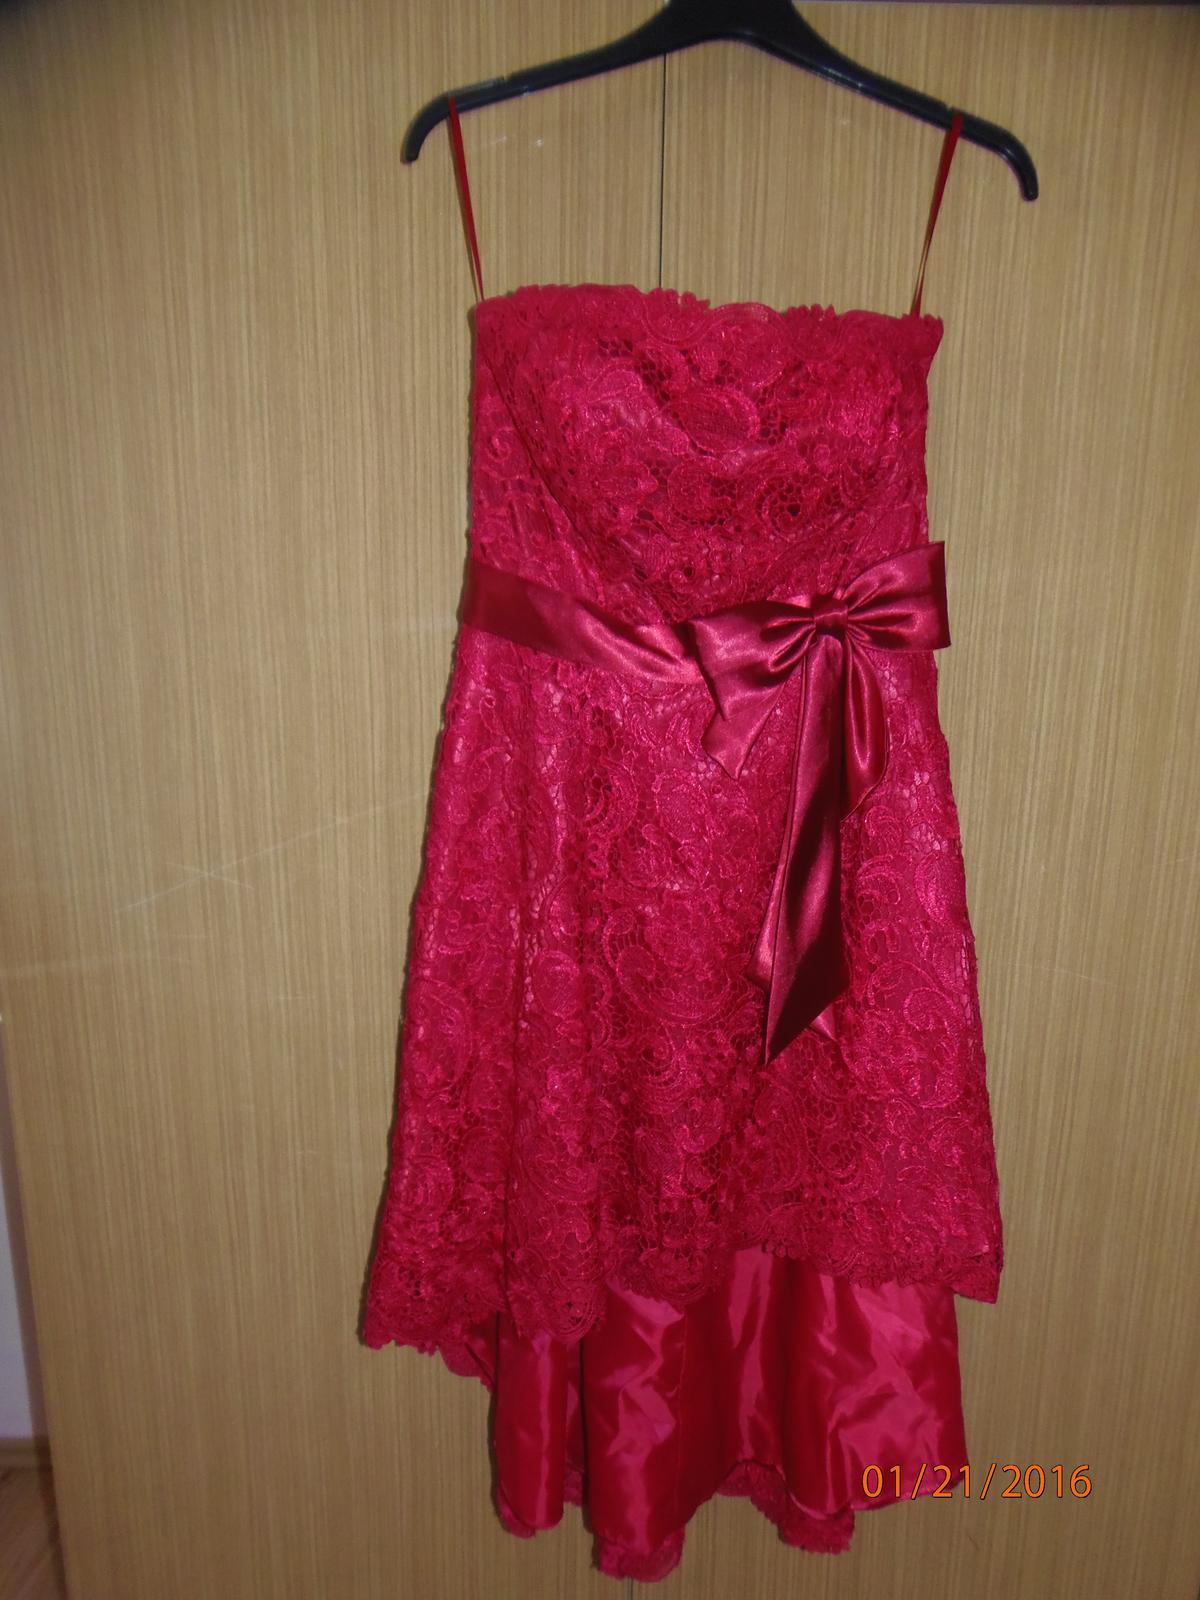 3c732785c871 Spoločenské šaty + štóla + bolerko